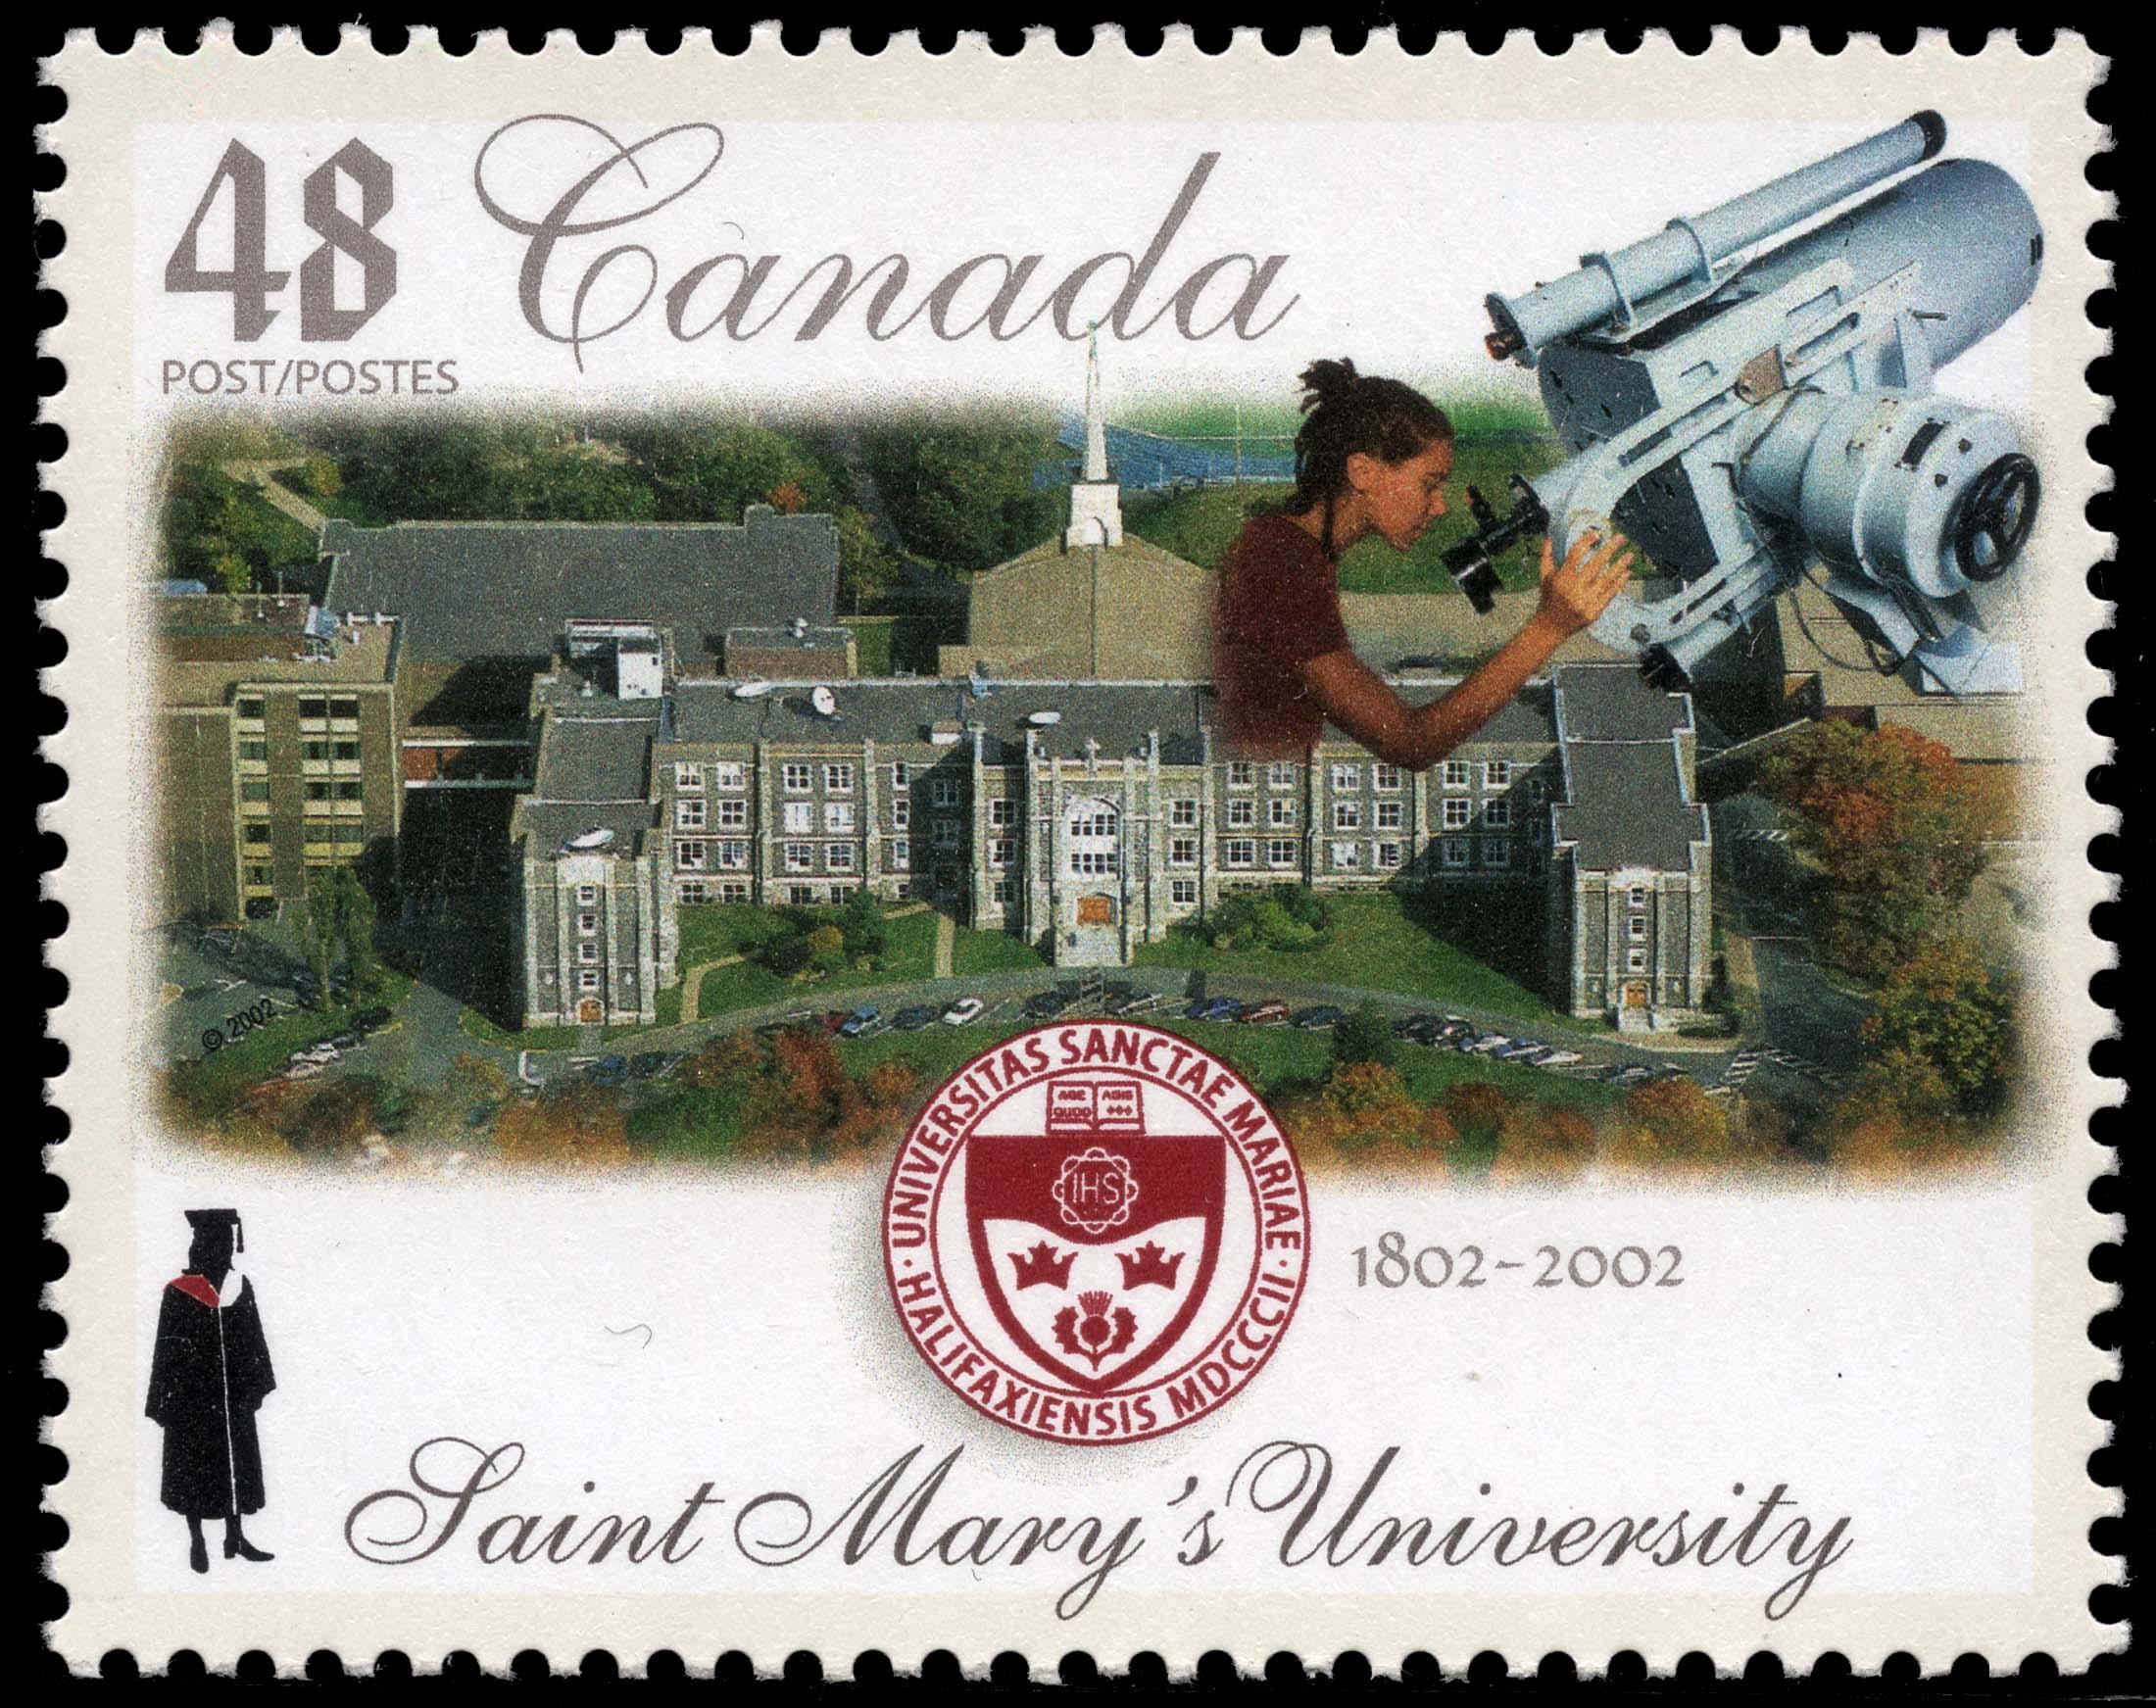 Saint Mary's University, 1802-2002 Canada Postage Stamp | Canadian Universities